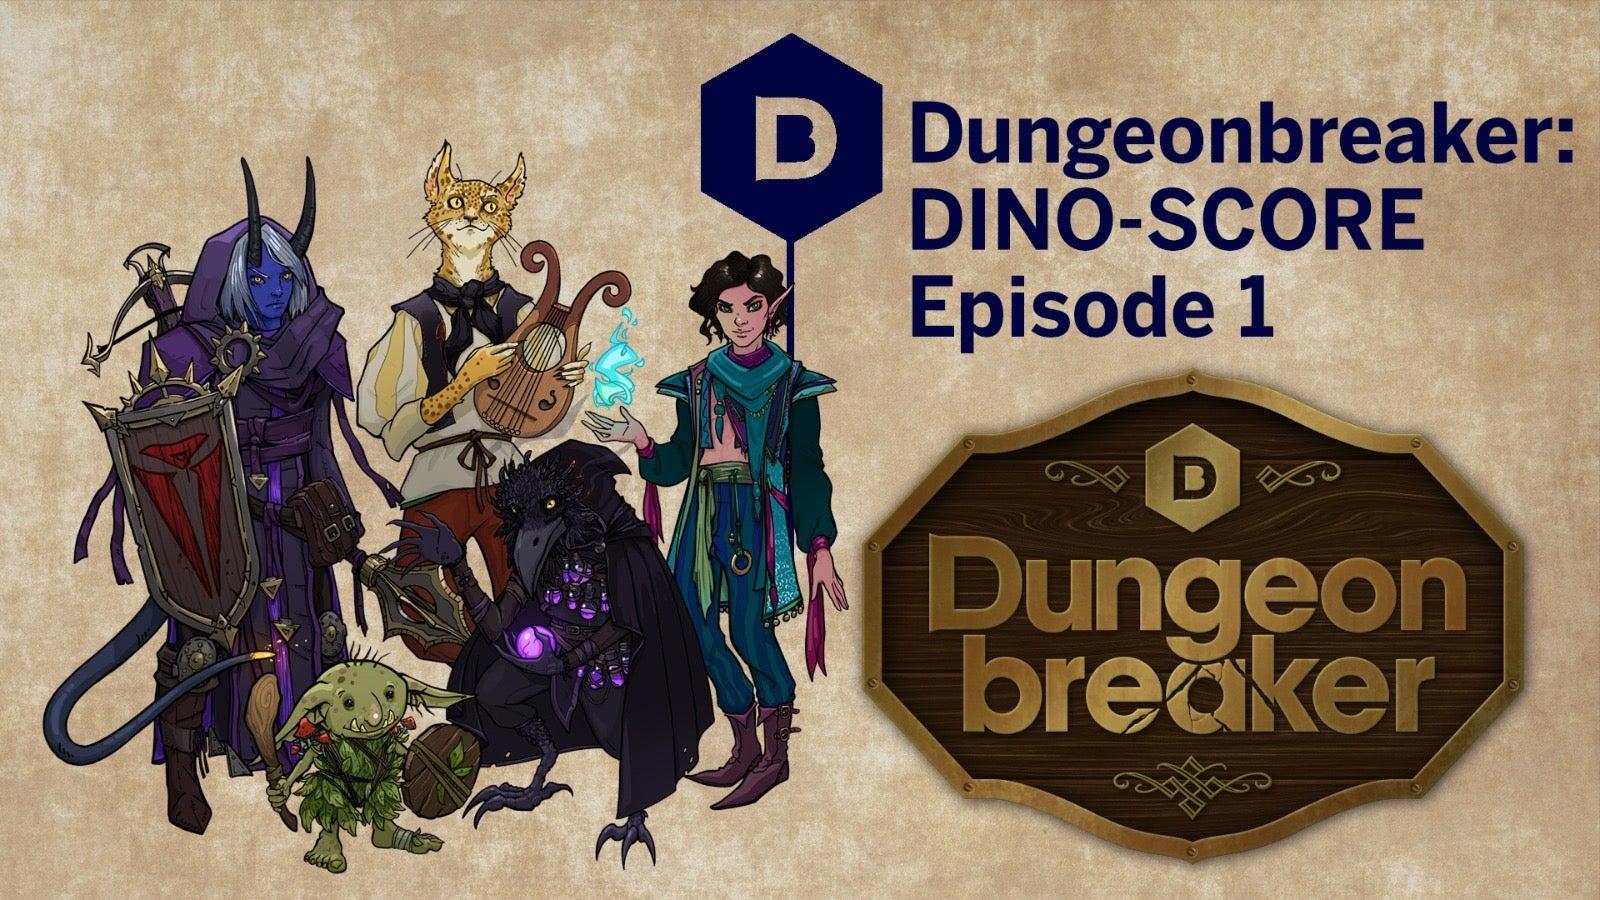 dungeonbreaker-dino-score-episode-1.JPG